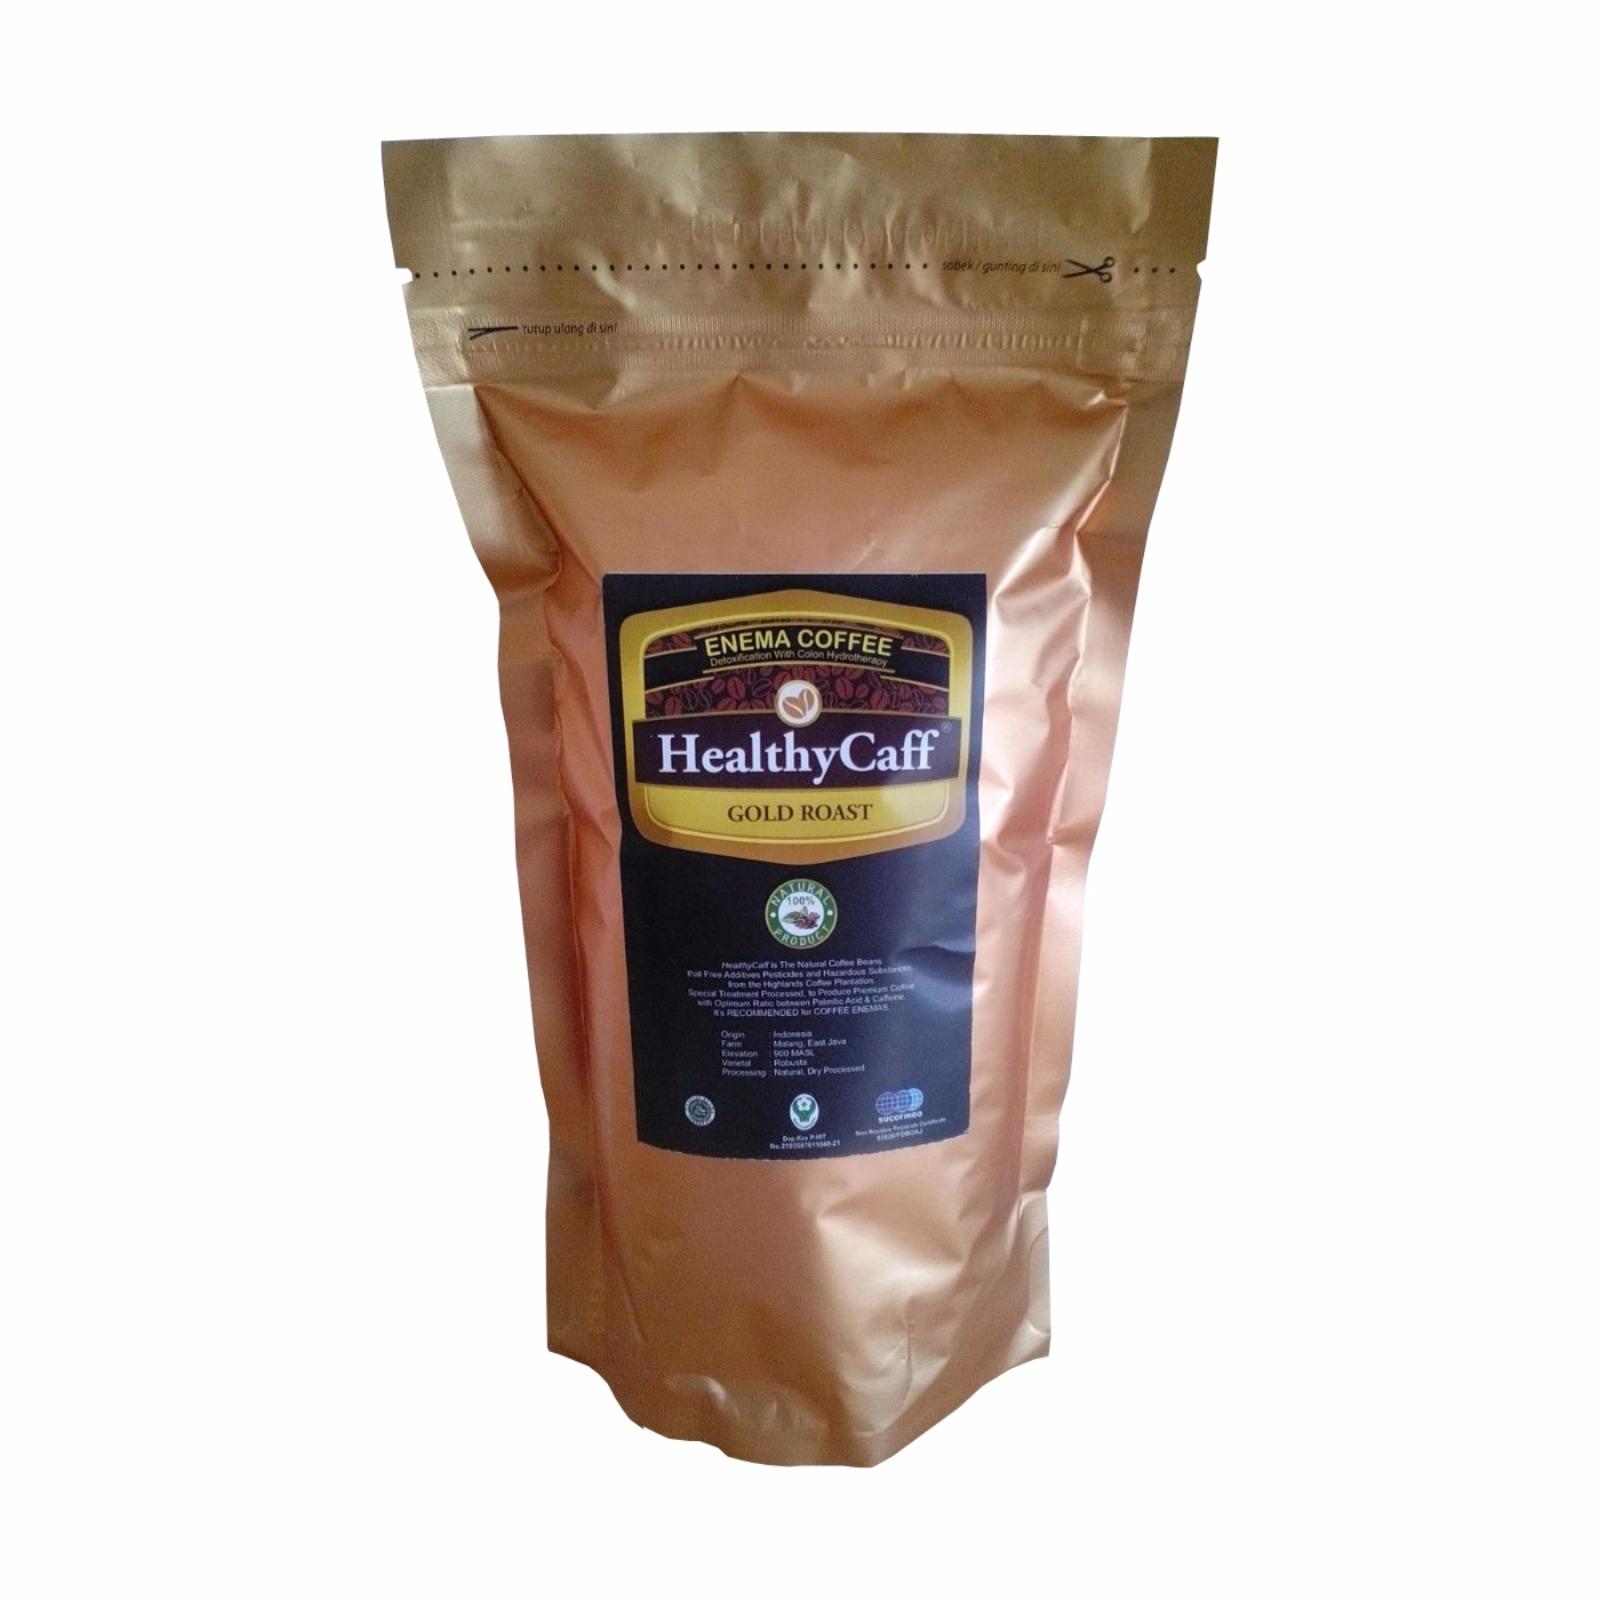 Kopi Enema Gold Roast Healthycaff Daftar Harga Terlengkap Indonesia Paket Terapi Gerson Alat Robusta Organik Jual